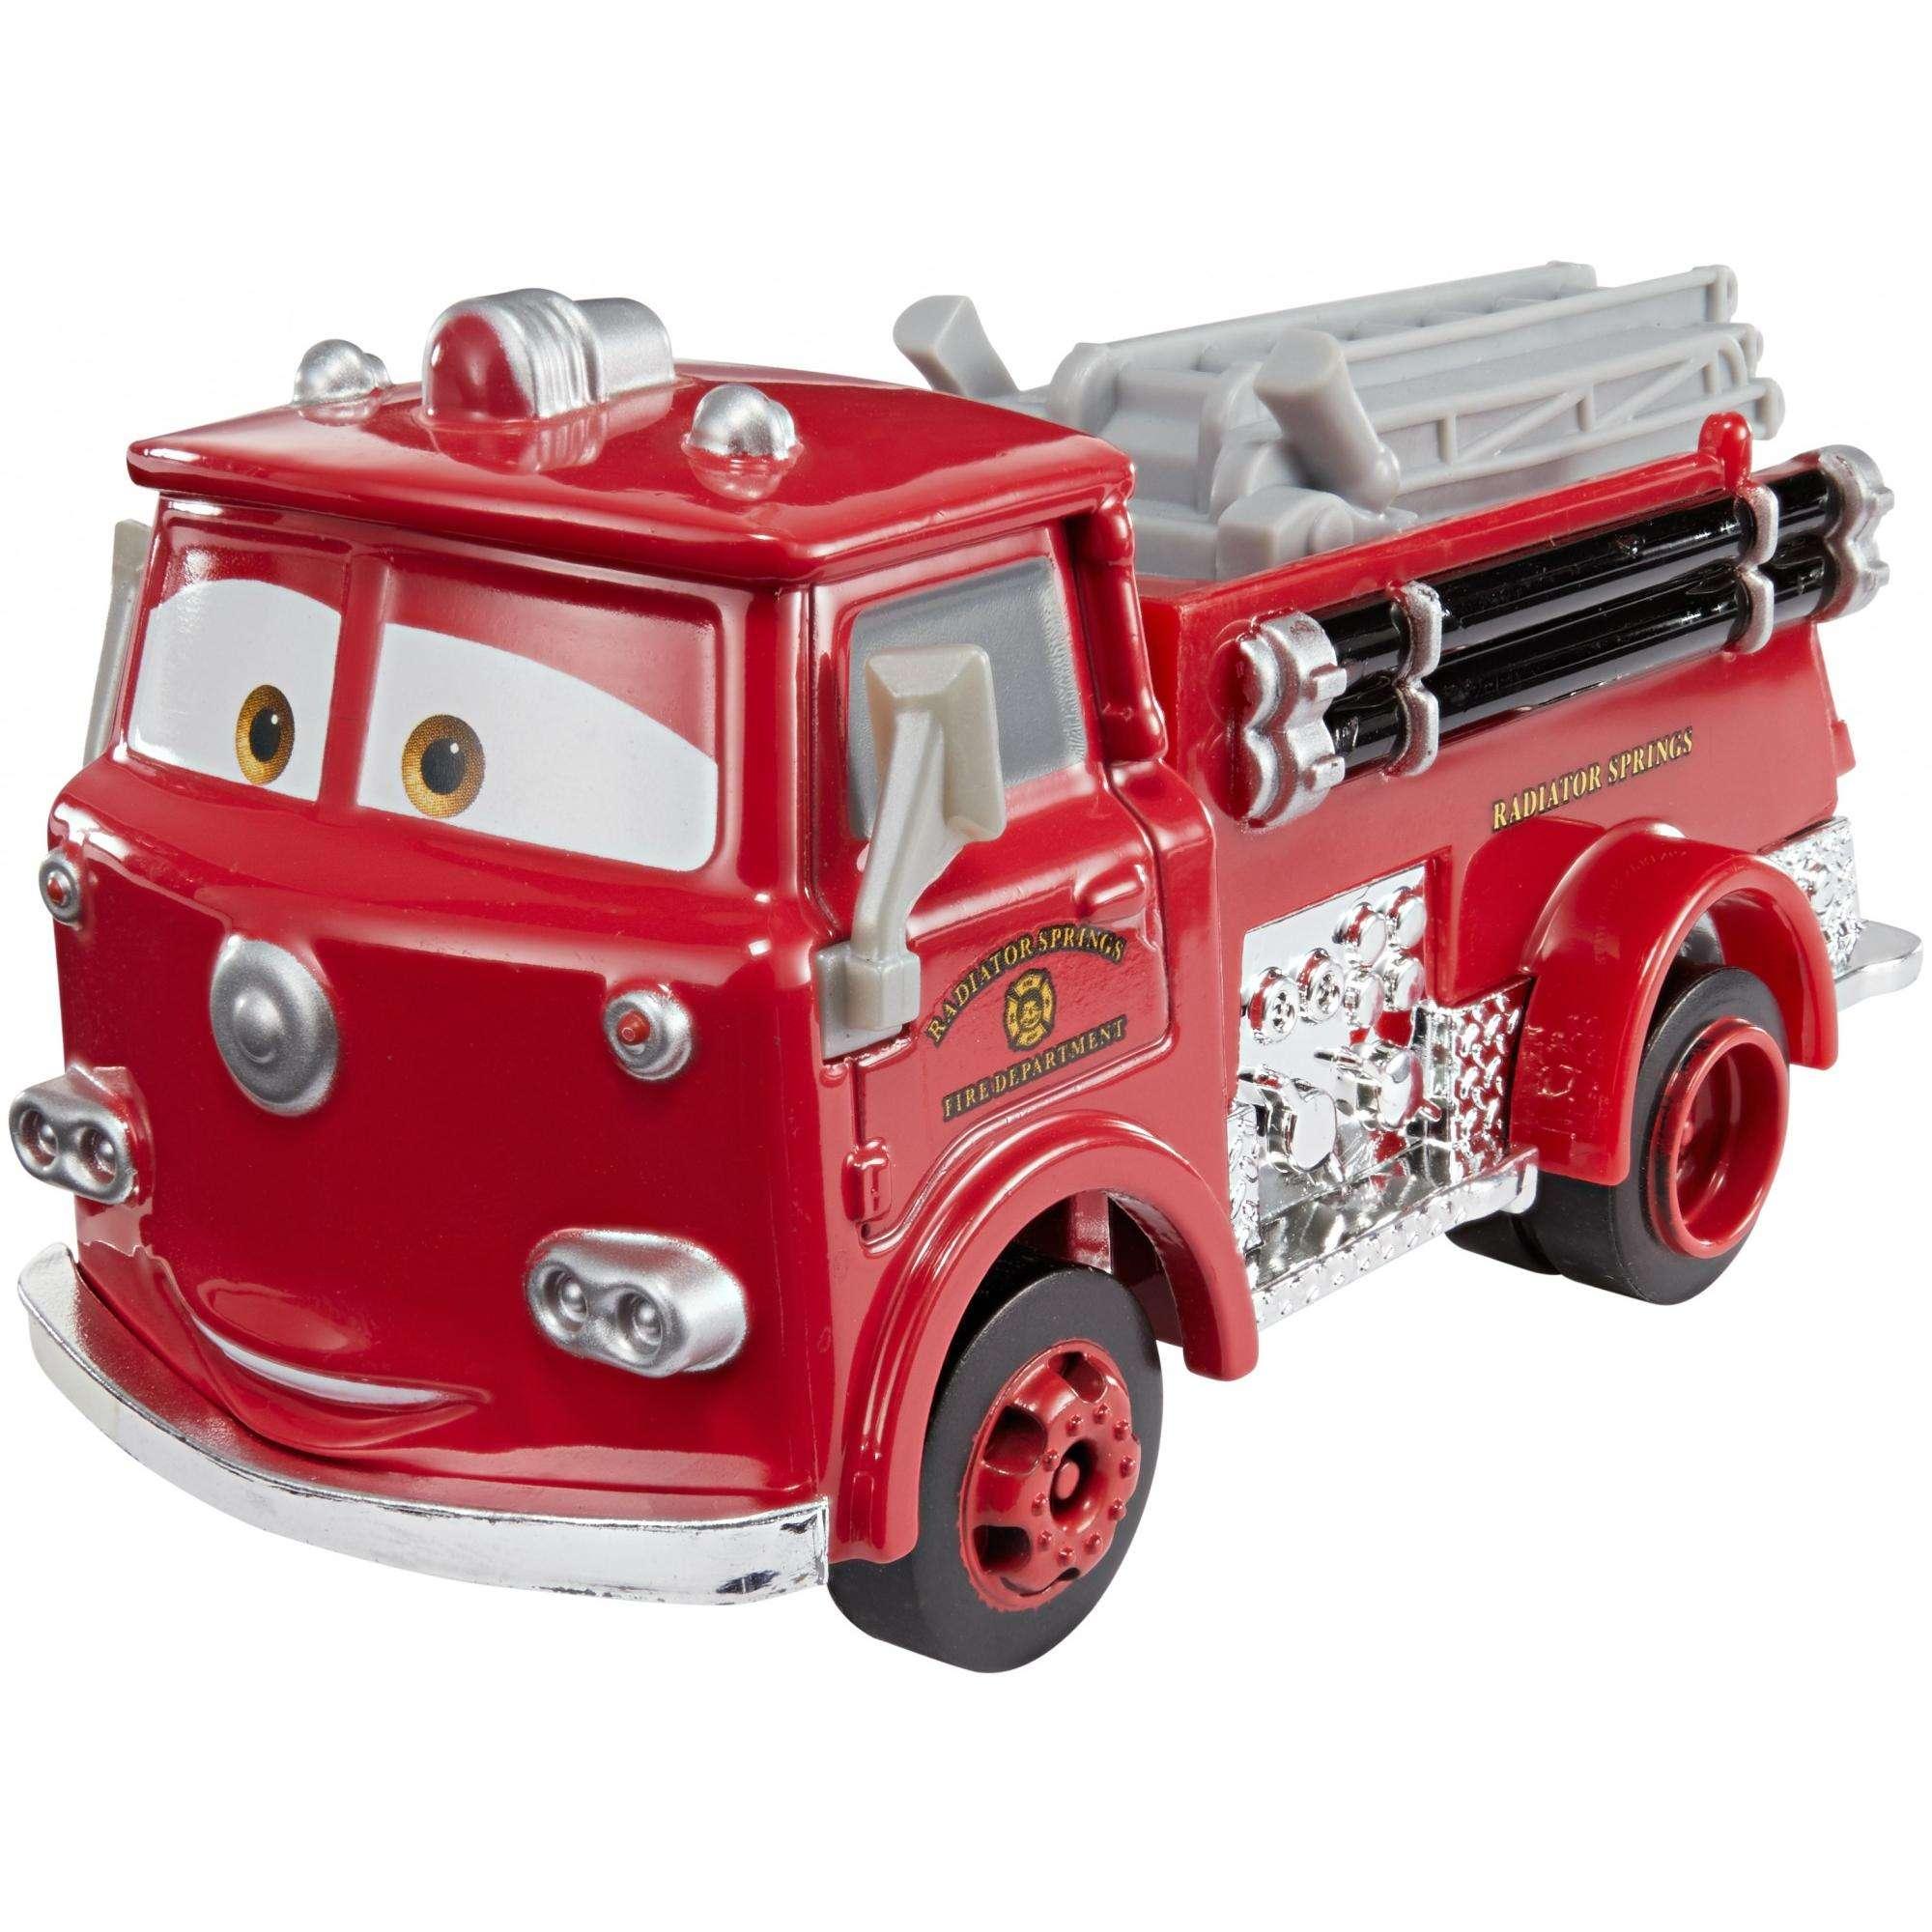 disneypixar cars 3 deluxe red 155 scale vehicle